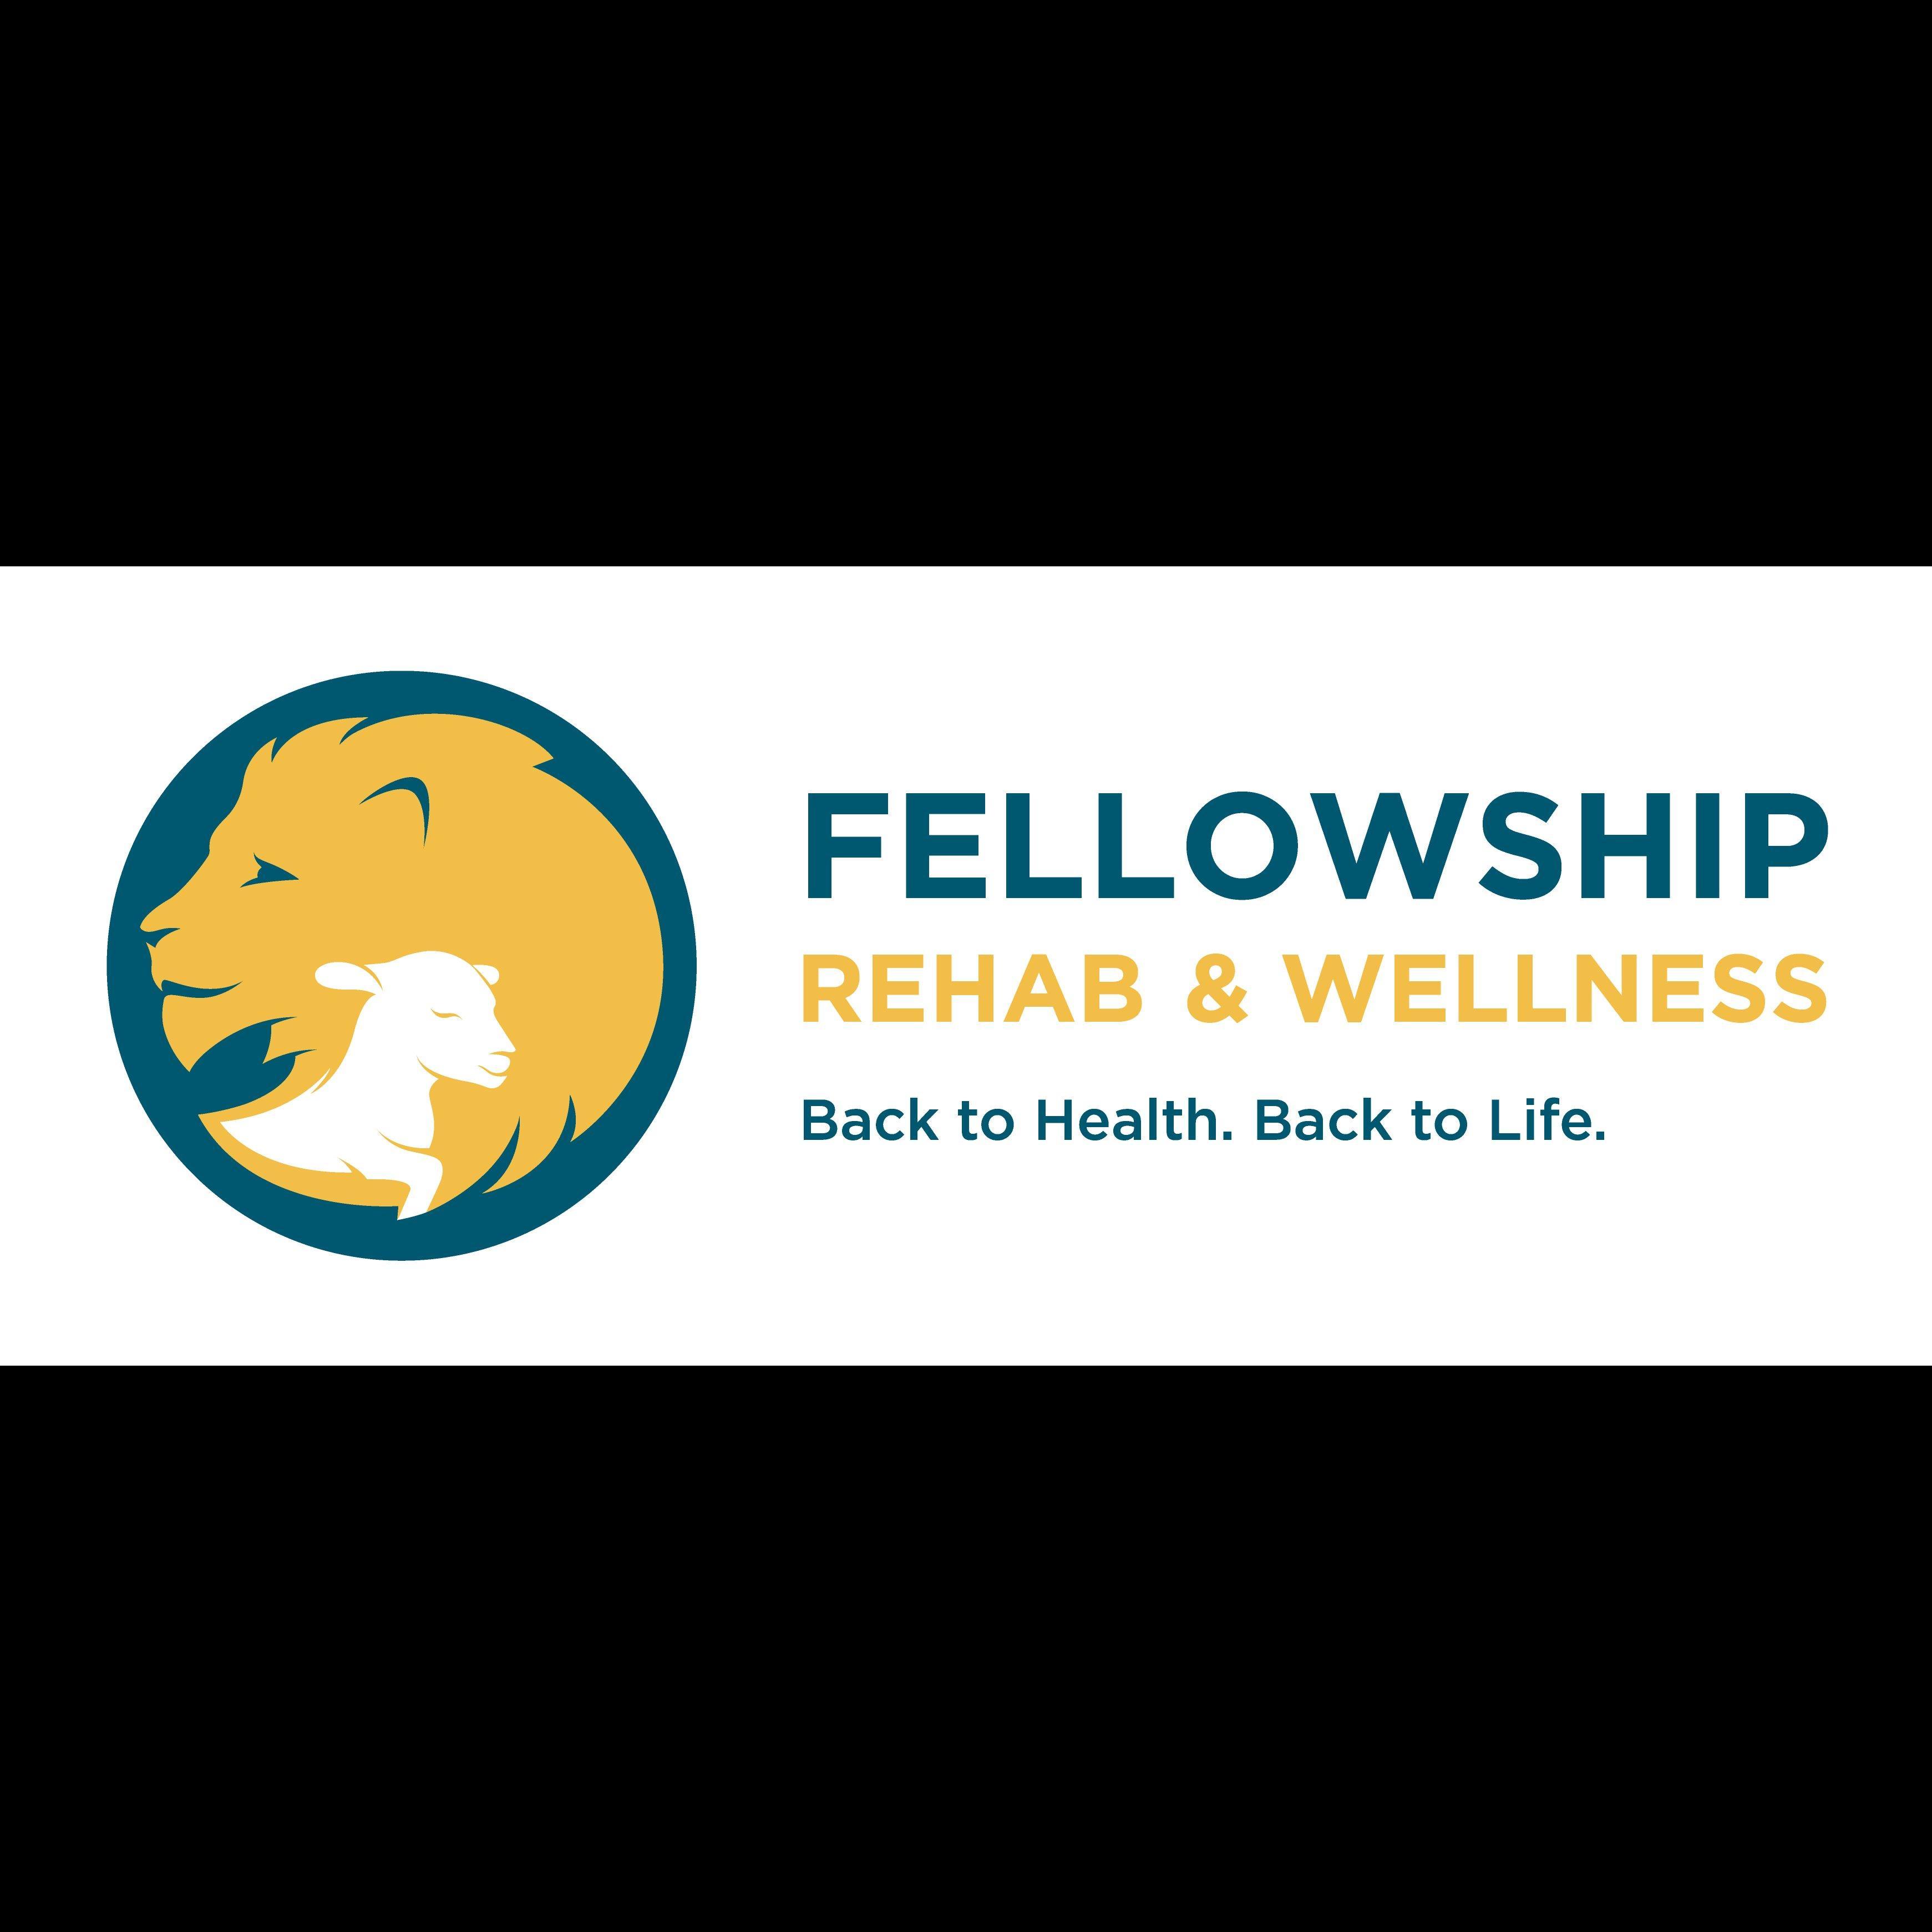 Rehab & Wellness at Fellowship Village